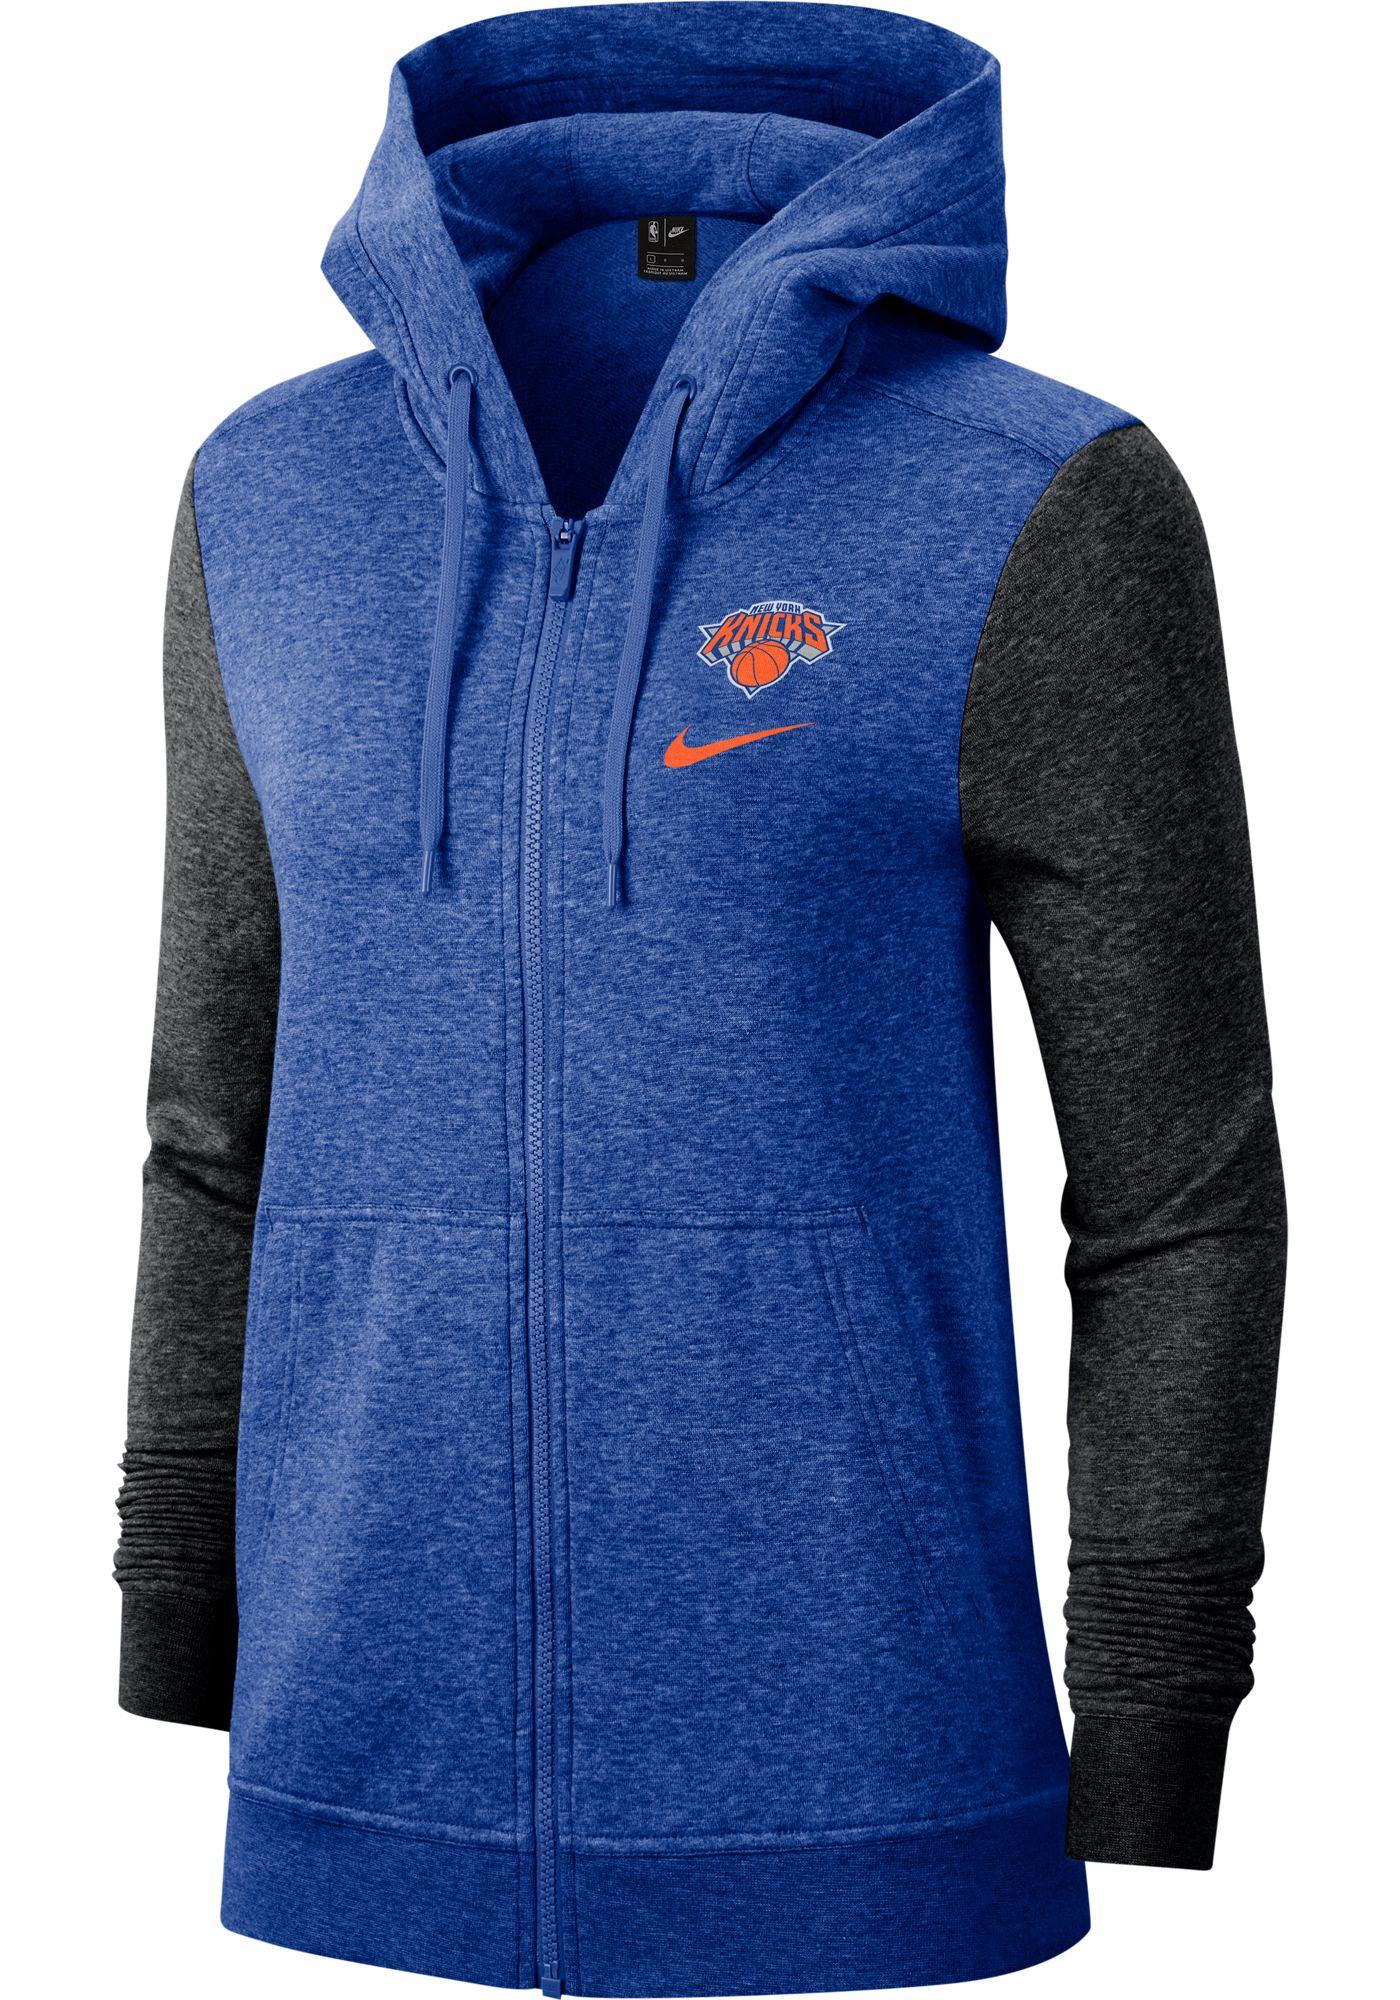 Nike Women's New York Knicks Raglan Full-Zip Hoodie